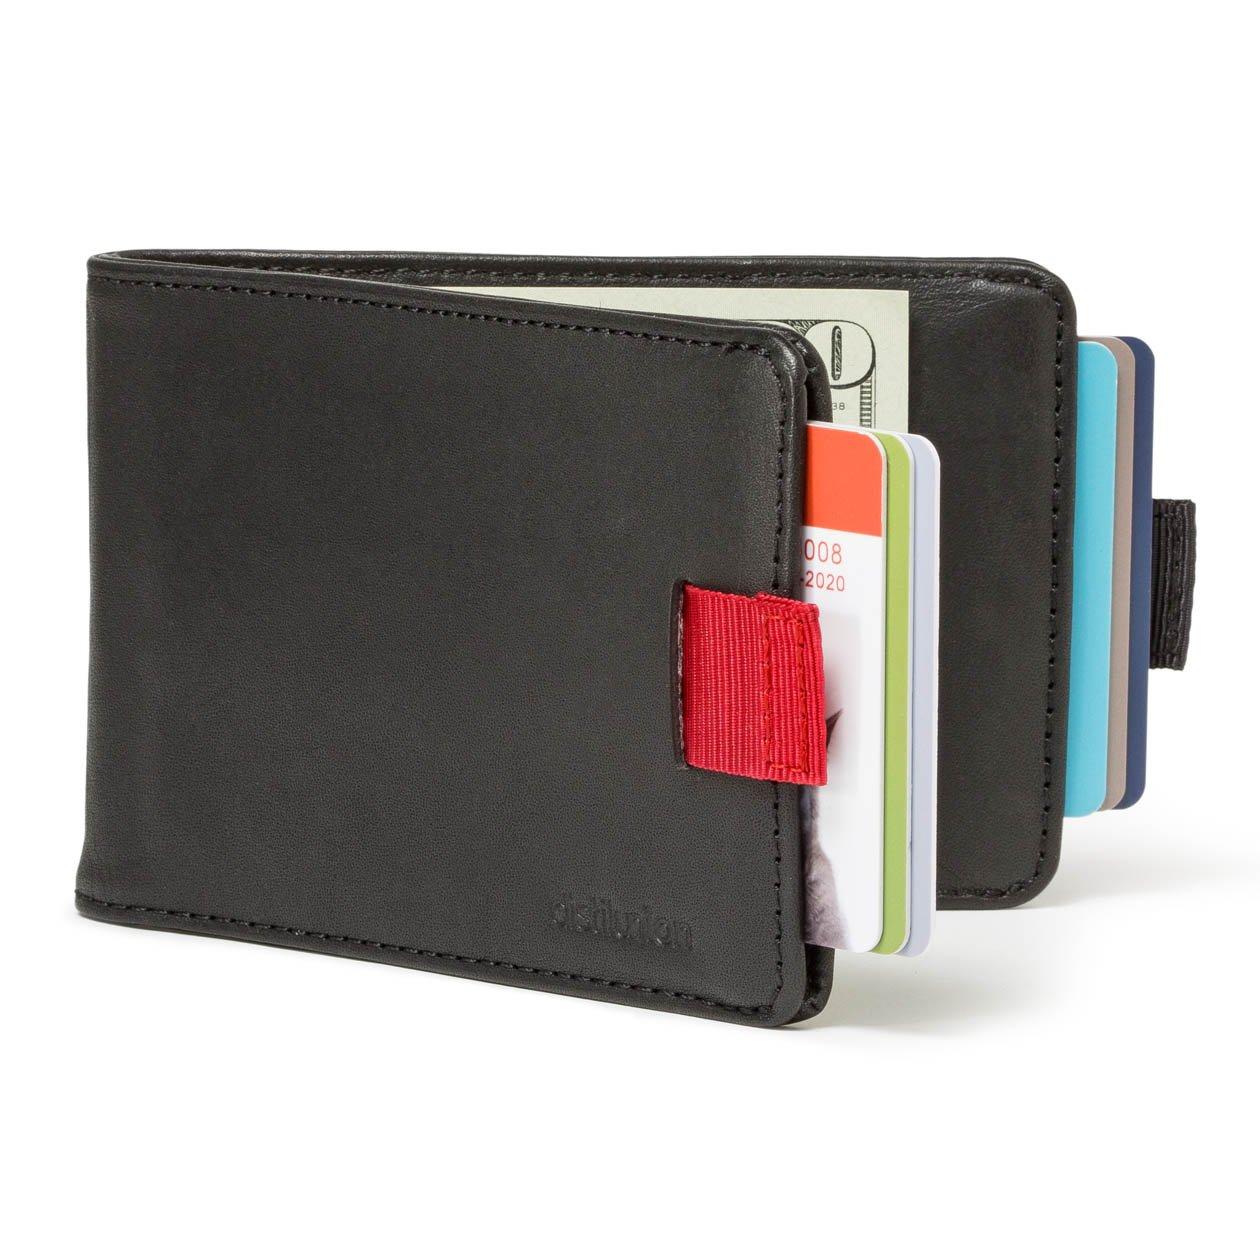 Distil Union - Minimalist Leather Slim Bifold Wallets with Money Clip, Credit Card Holder (Ink with Flexlock)